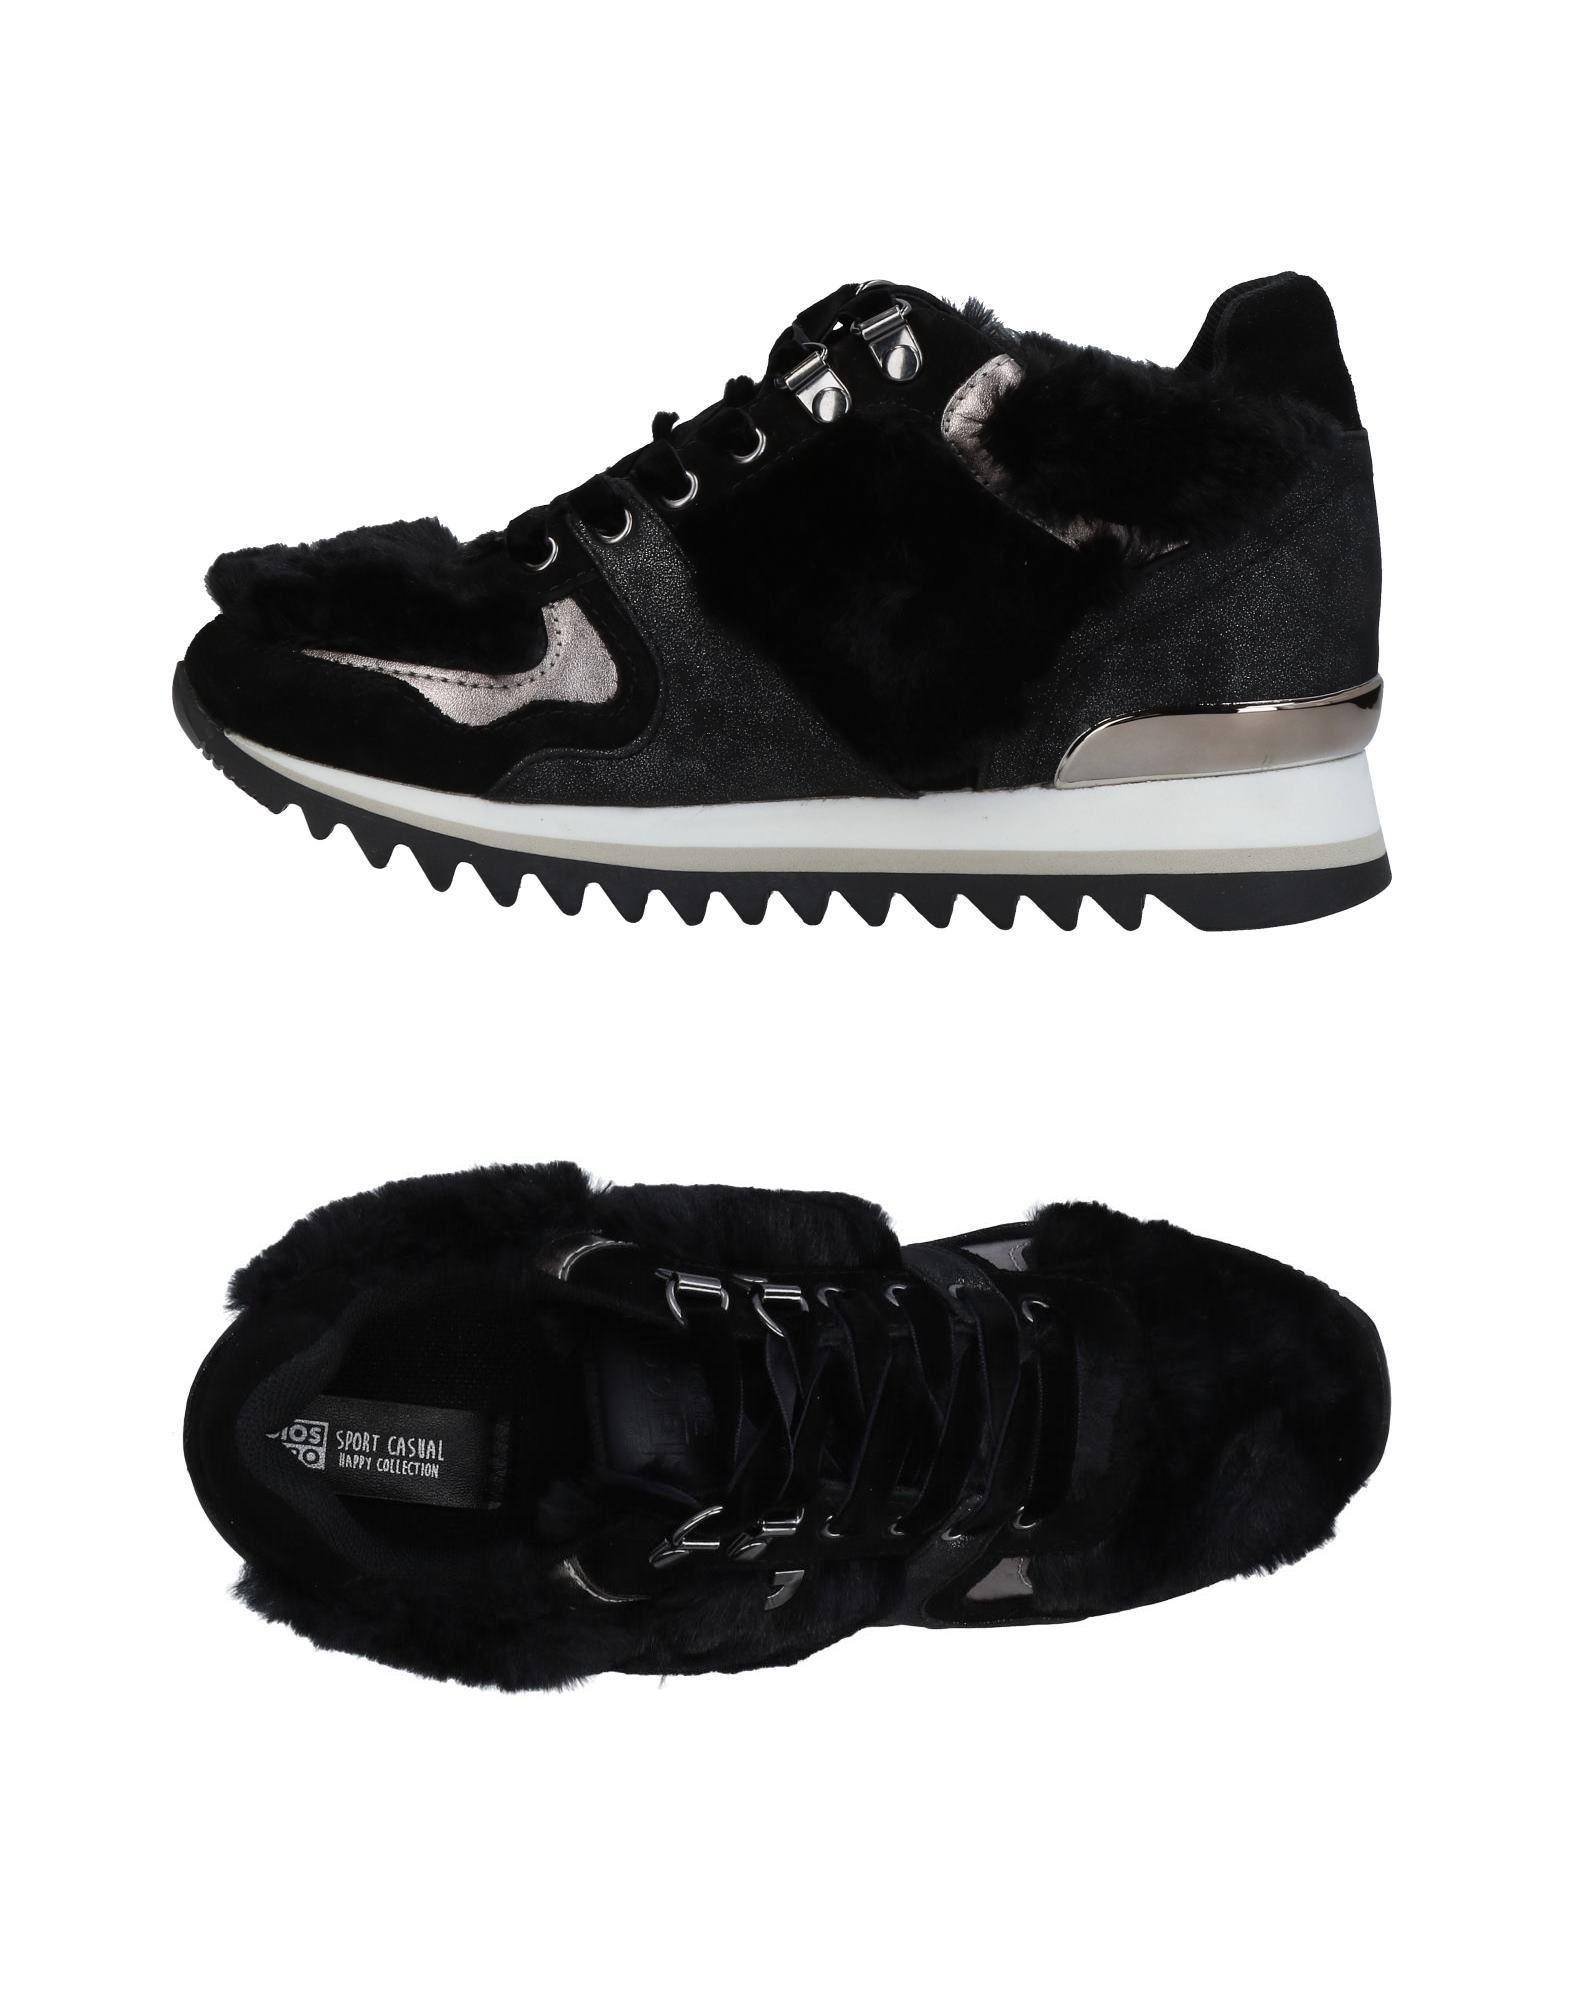 Sneakers Scarpe Gioseppo Donna - 11462435CV Scarpe Sneakers comode e distintive 0a4278